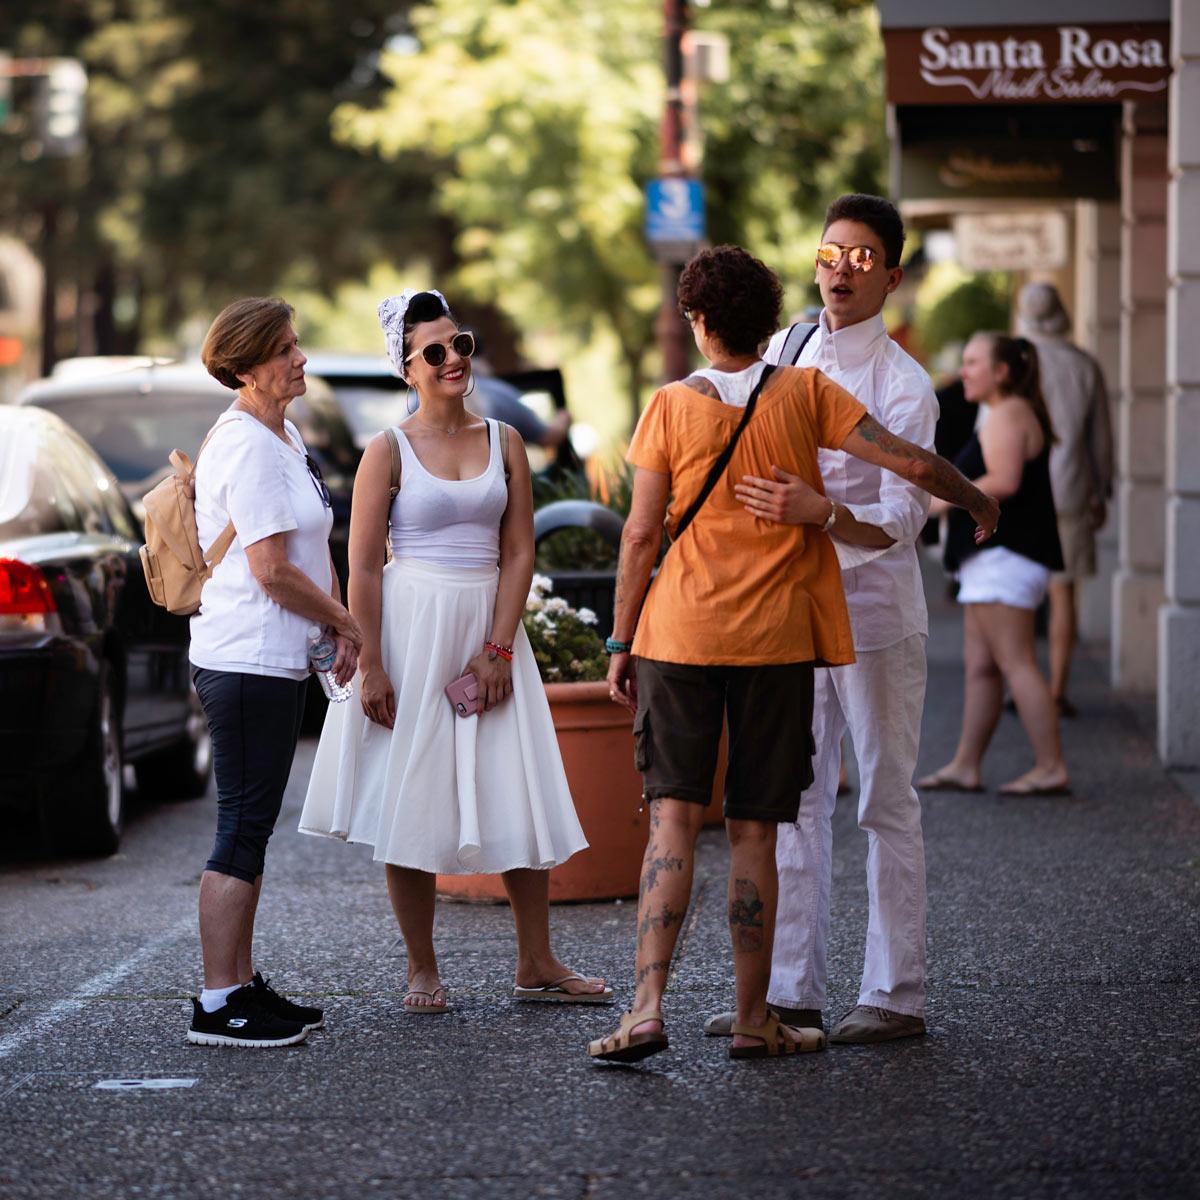 Streets of Santa Rosa